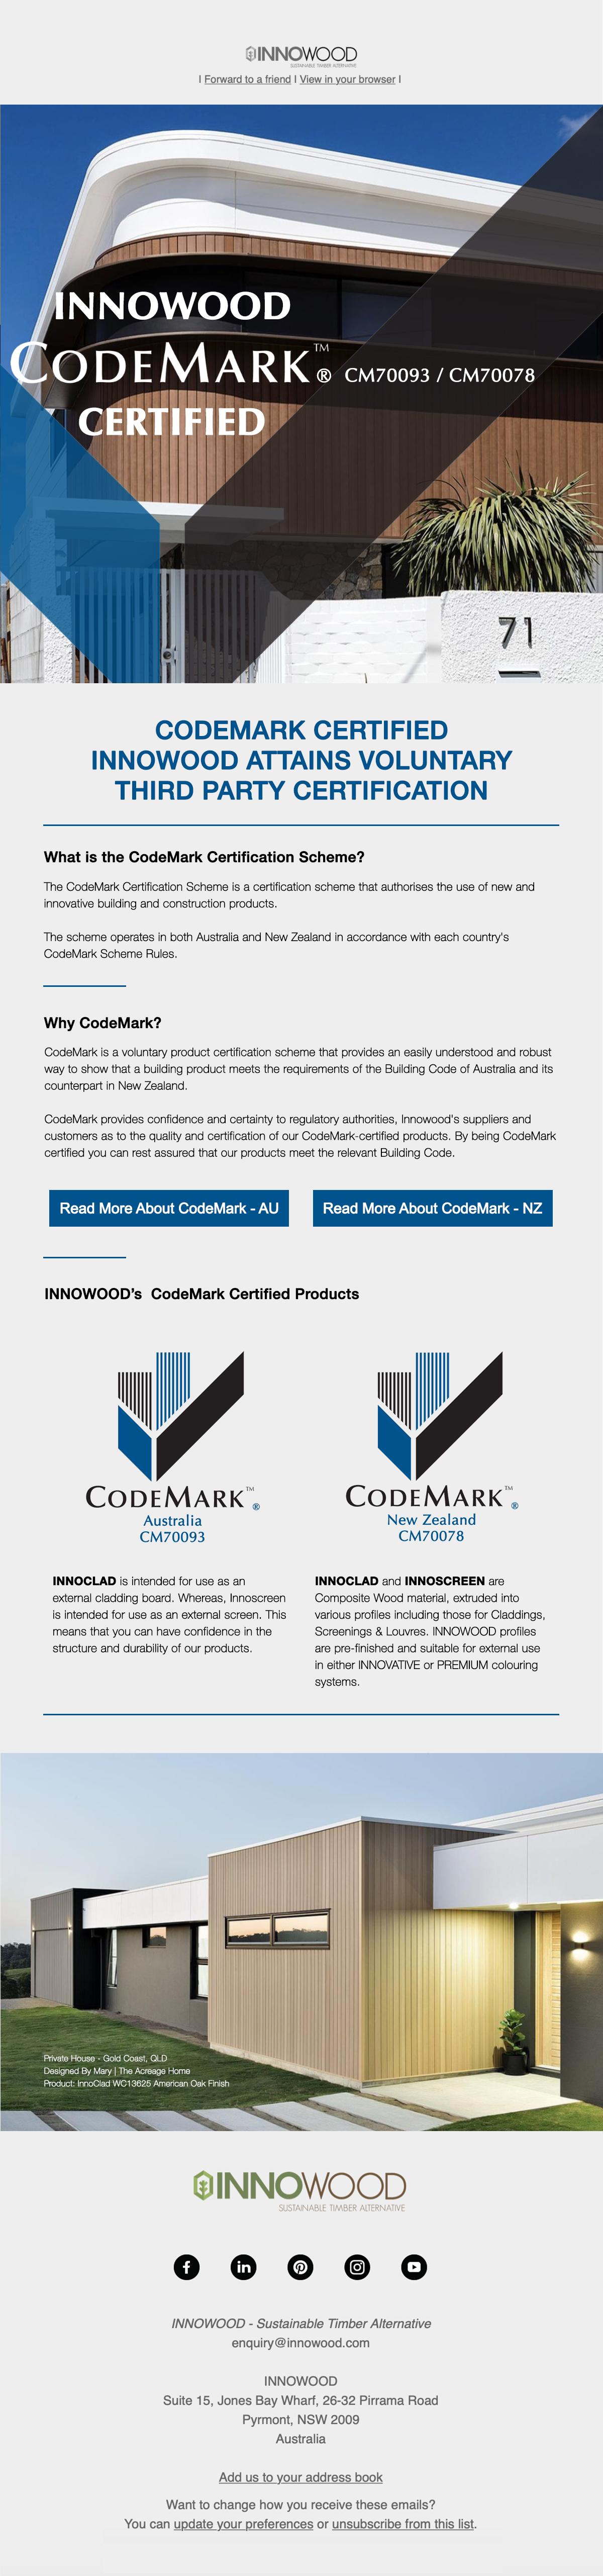 INNOWOOD CodeMark Australia Certified - V2